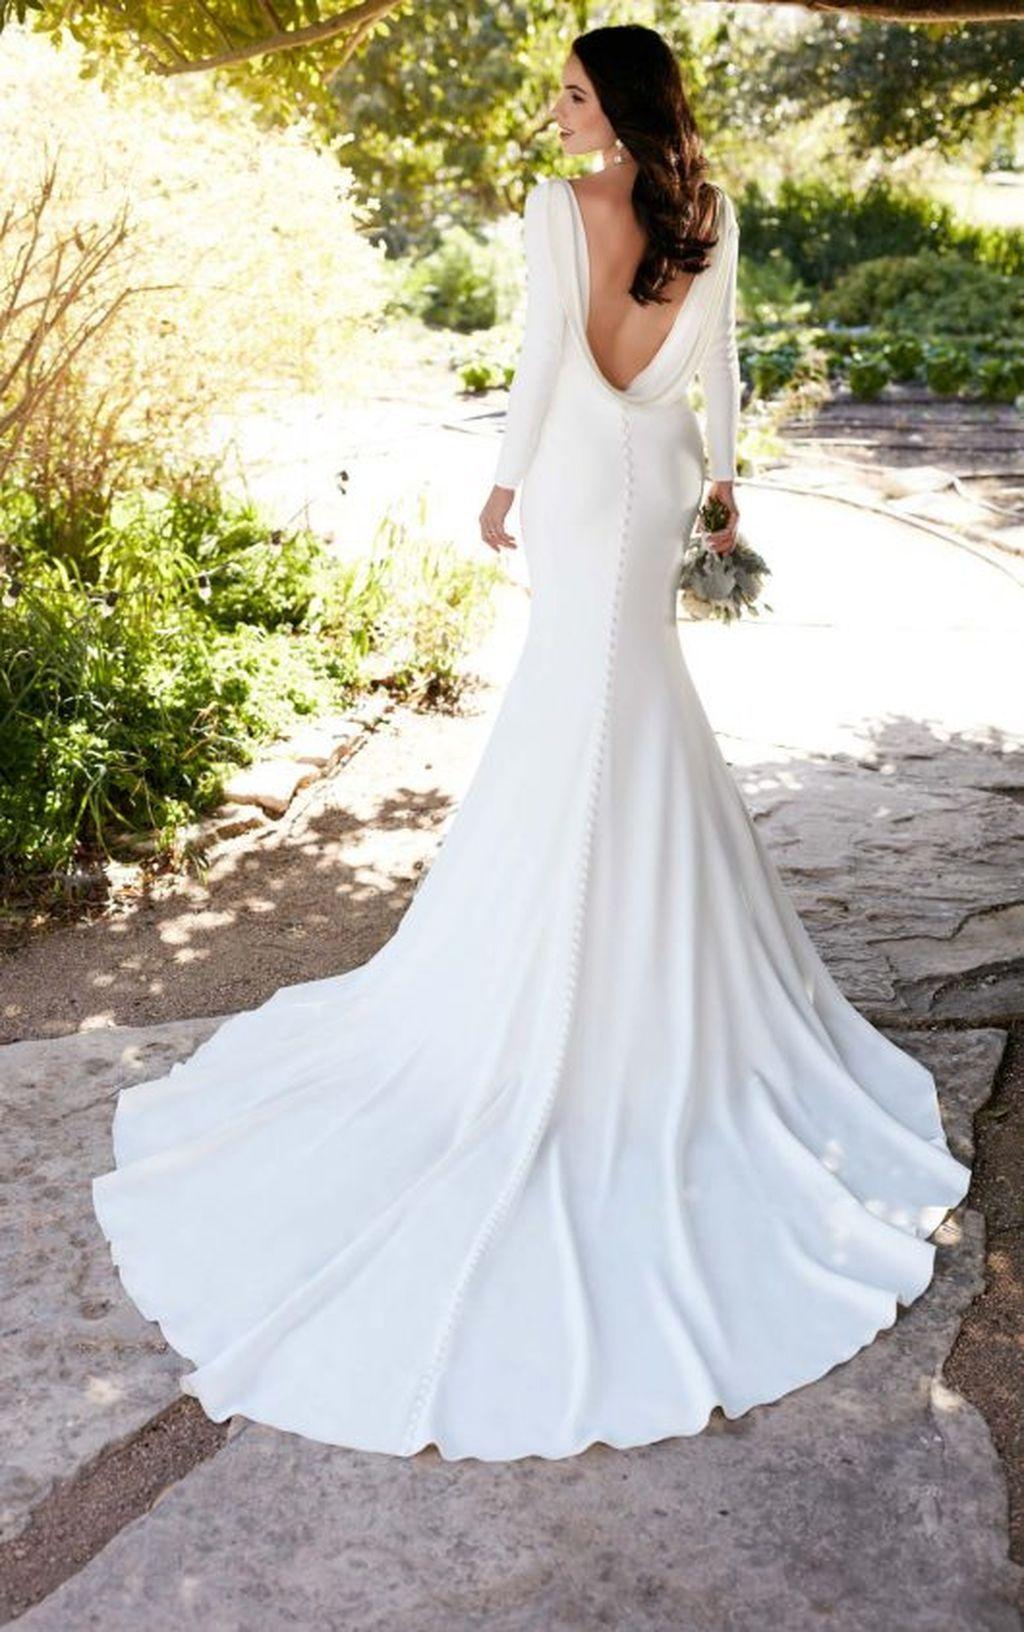 60 totally adorable long sleeve winter wedding dress ideas